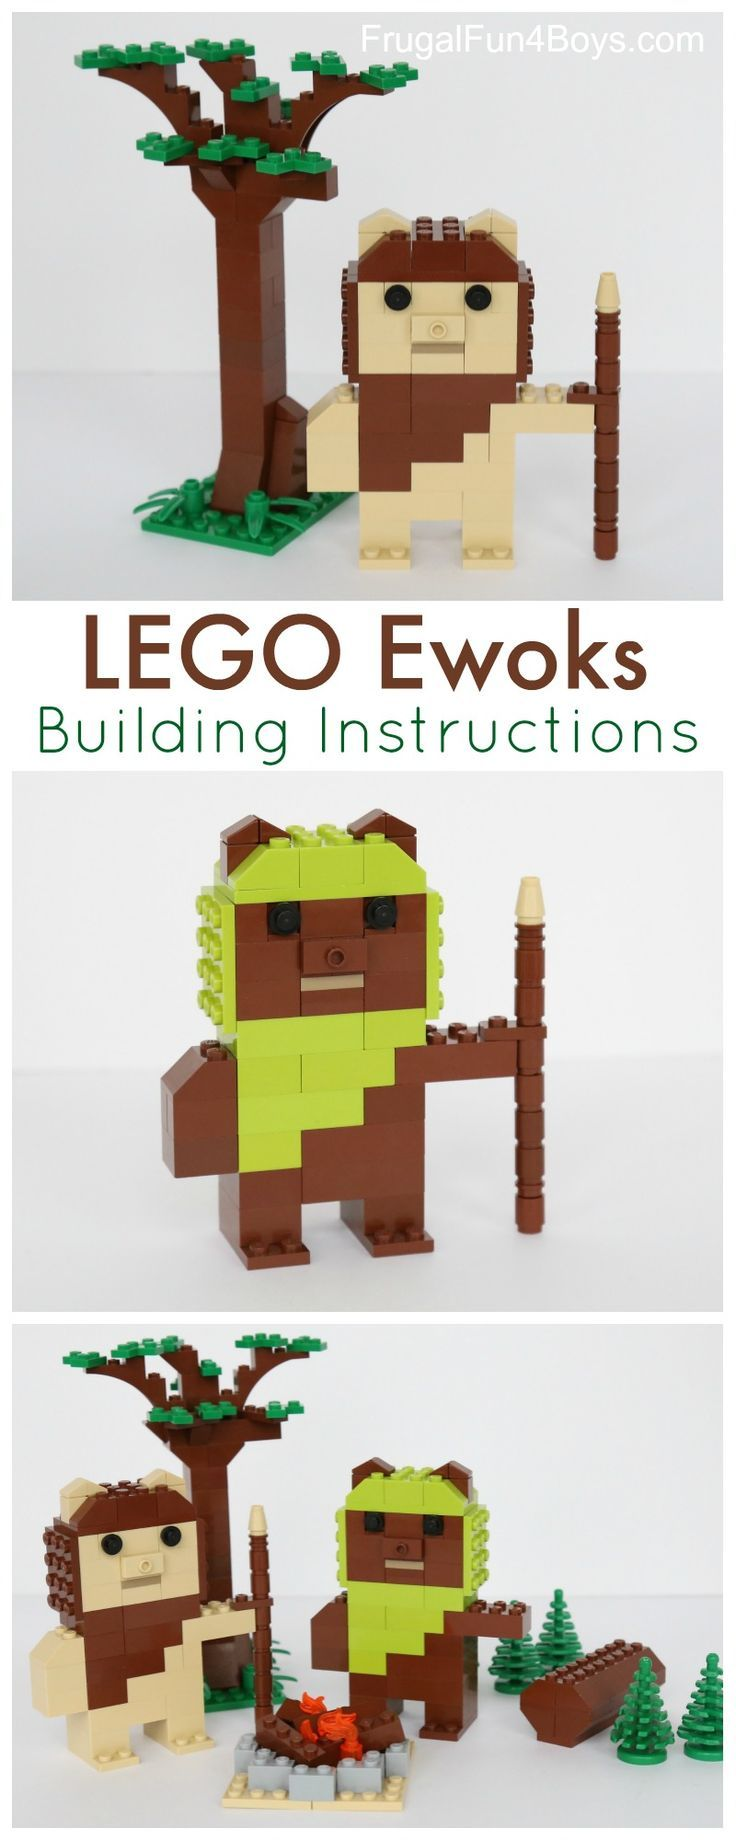 LEGO Star Wars - Ewoks Building Instructions